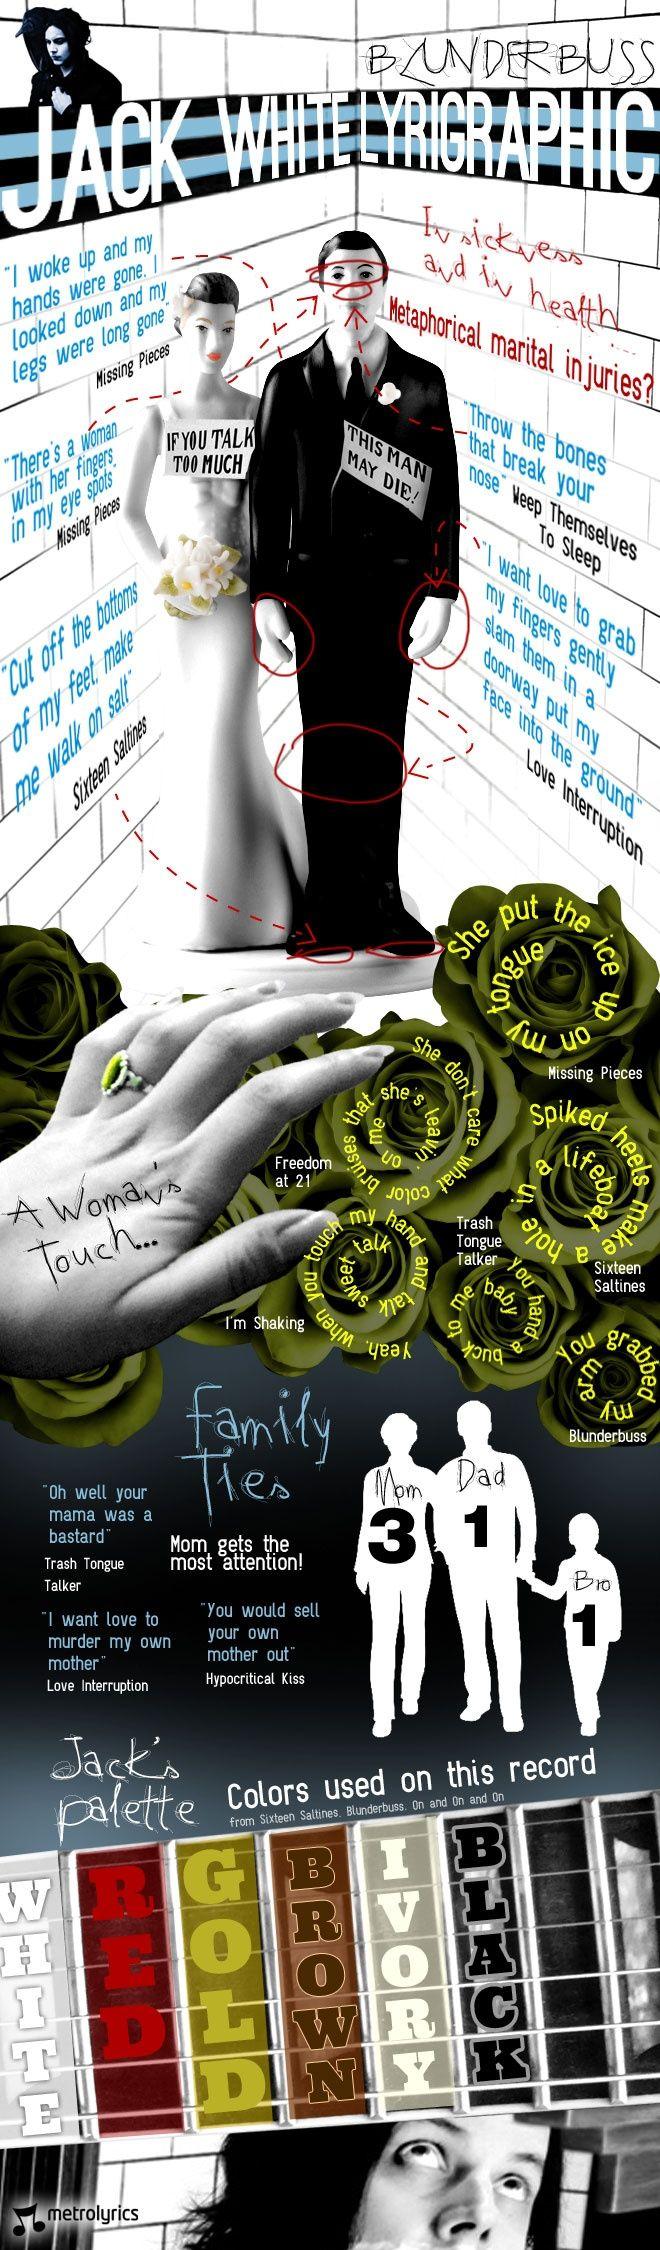 Jack White's new album 'Blunderbuss' gets the Lyrigraphic treatment...via Sony